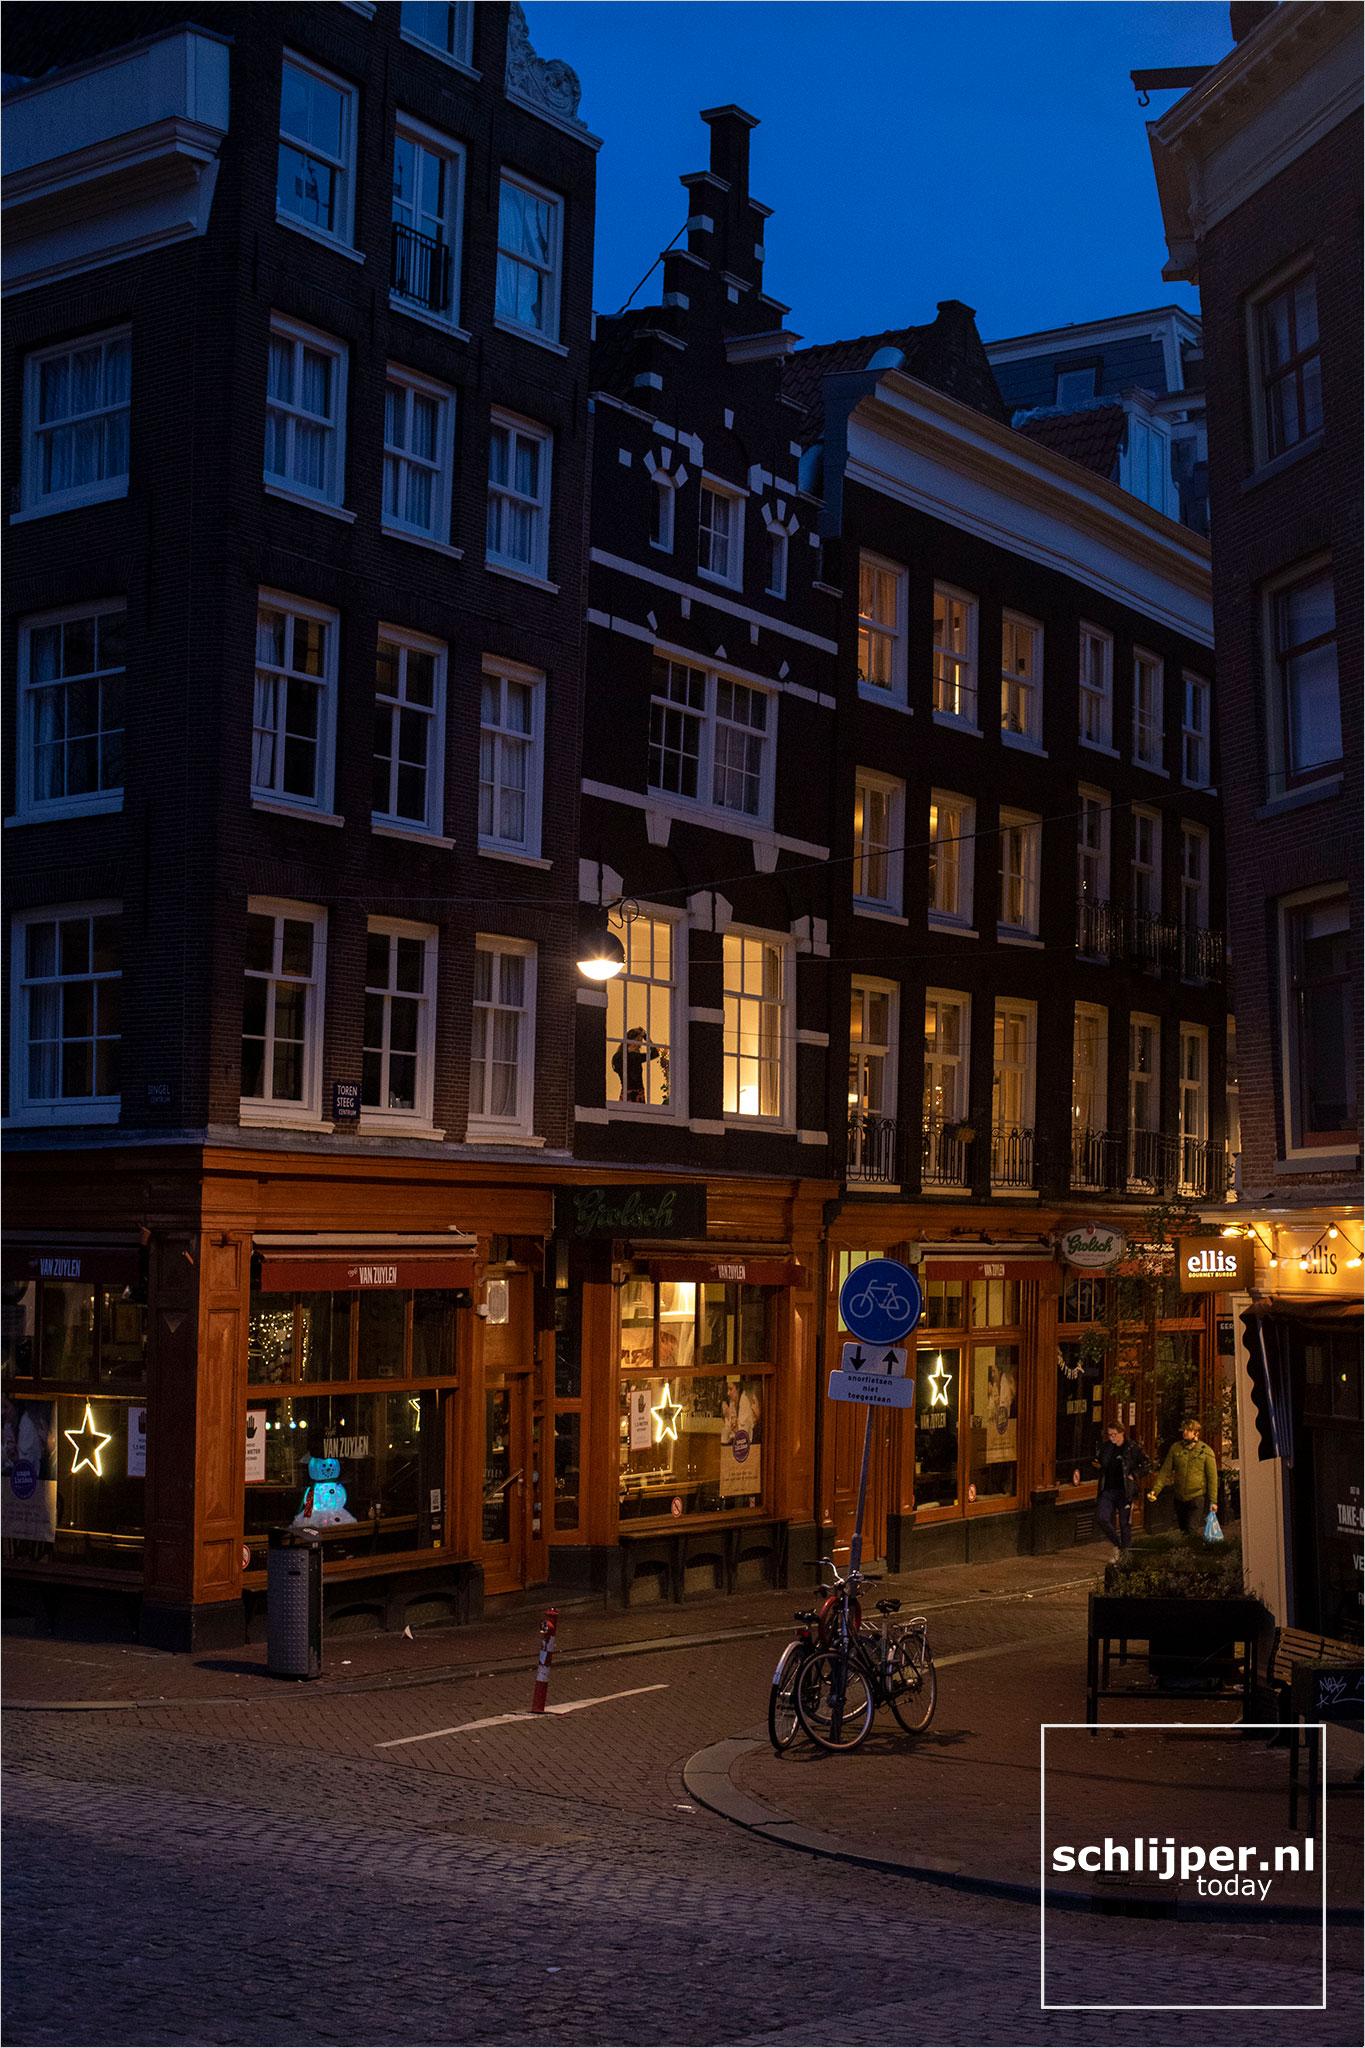 The Netherlands, Amsterdam, 28 december 2020